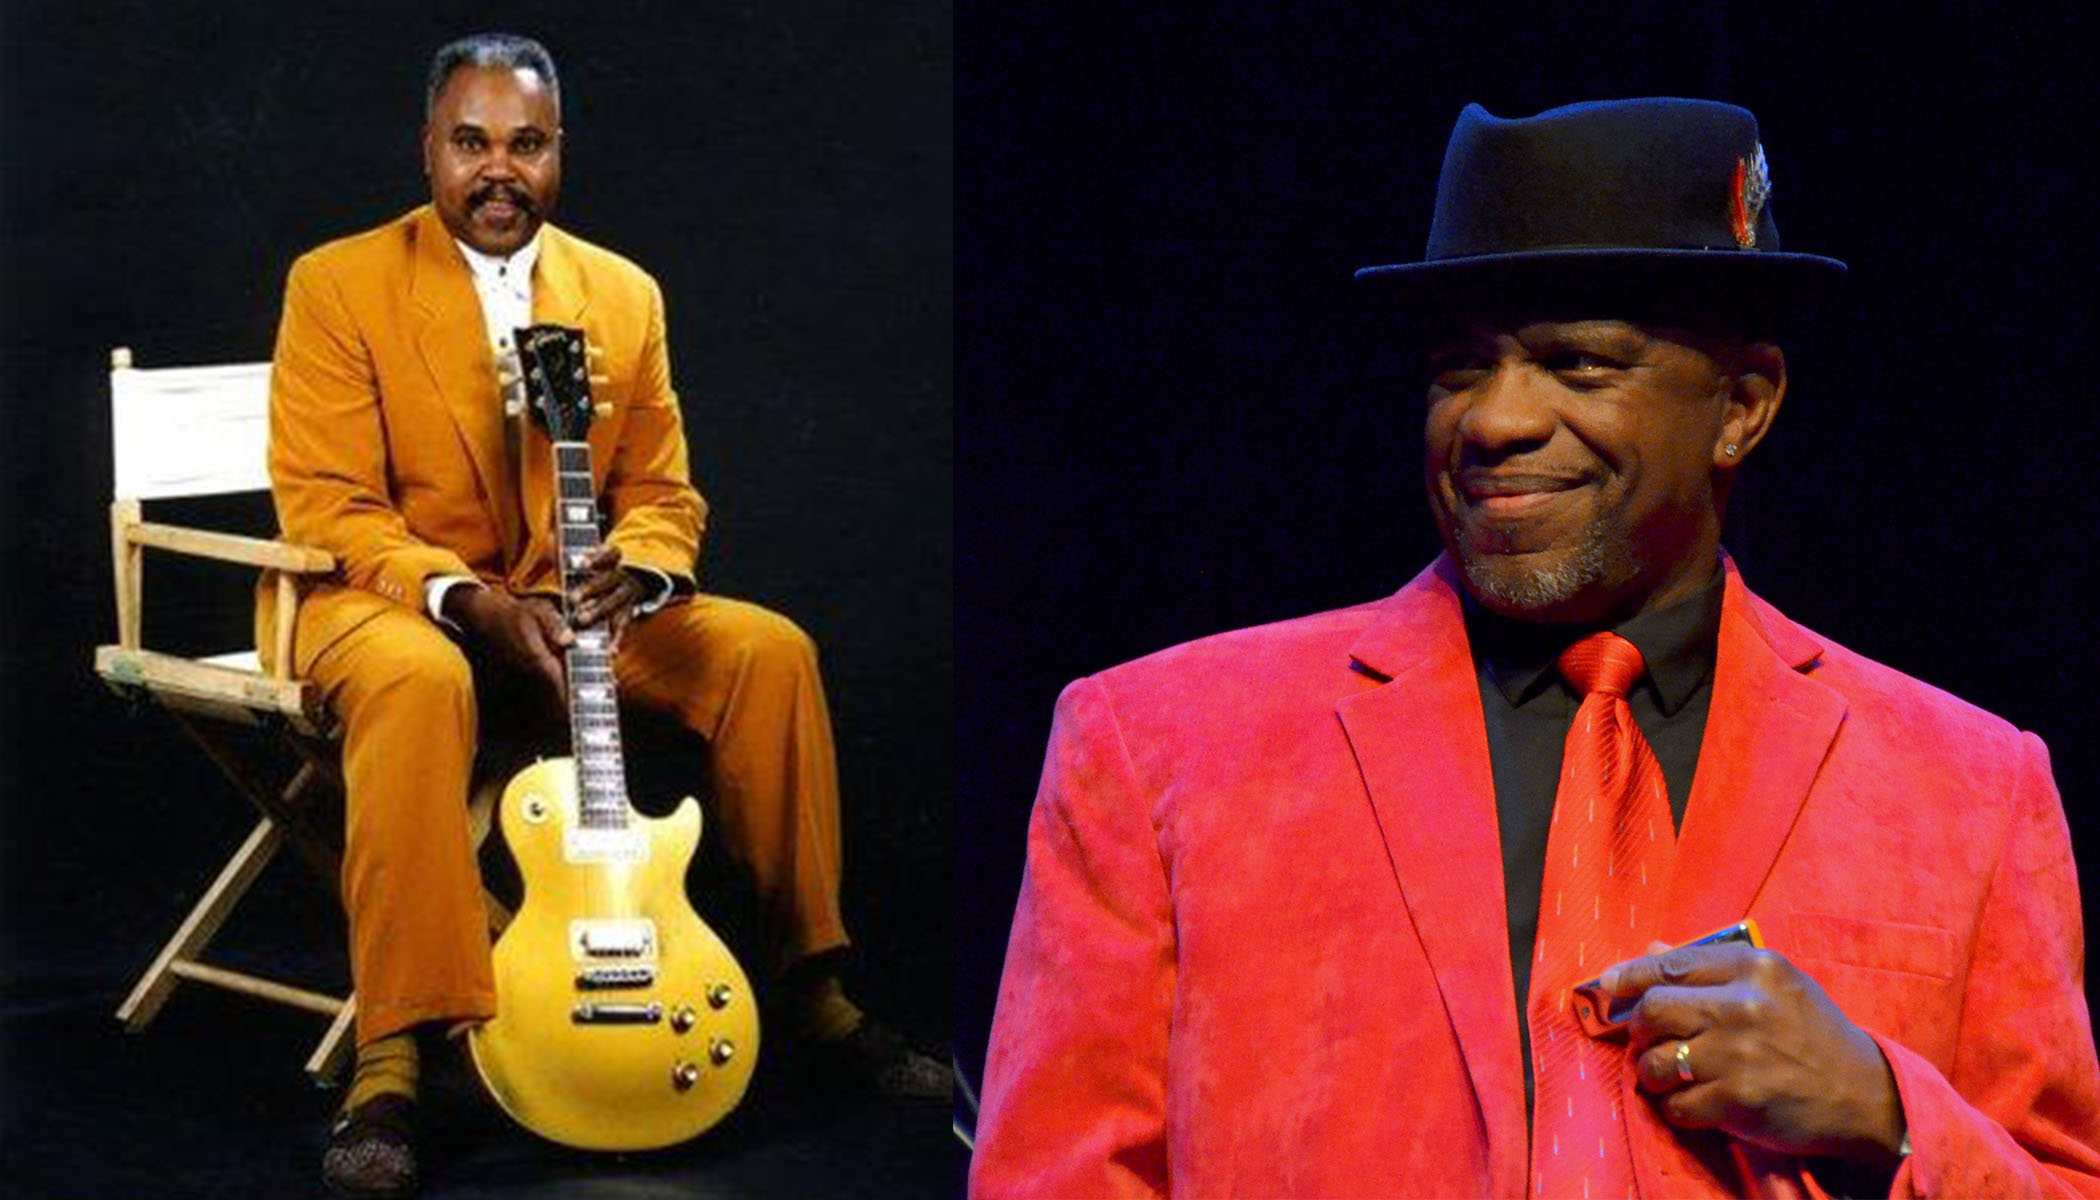 Bobby BlackHat & Memphis Gold